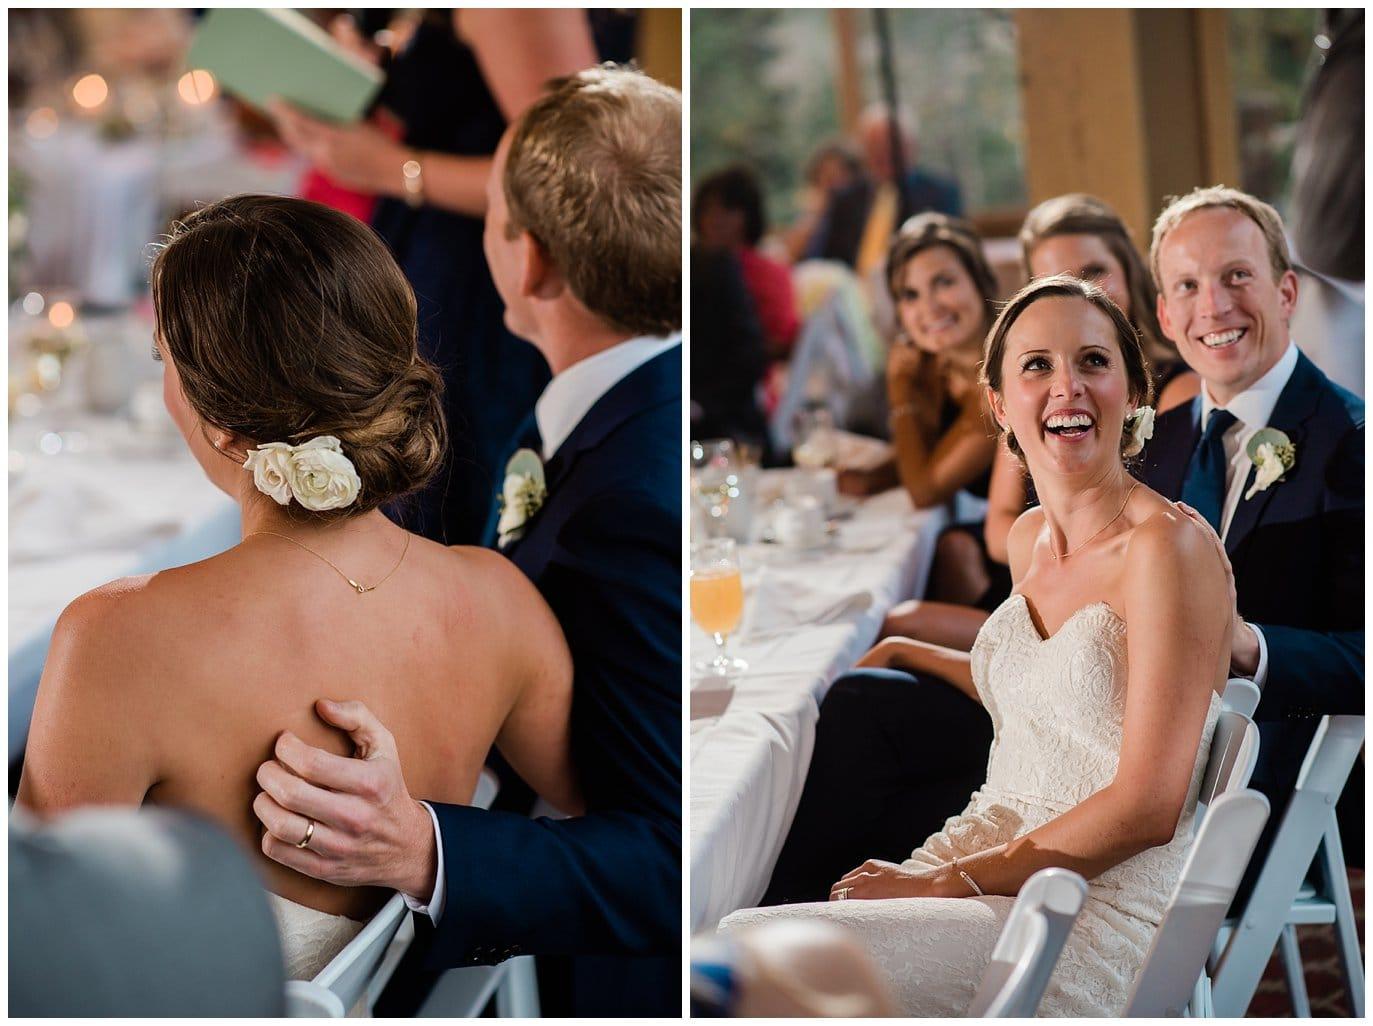 wedding toasts at Arapahoe Basin Black Mountain Lodge Wedding by Colorado Wedding Photographer Jennie Crate